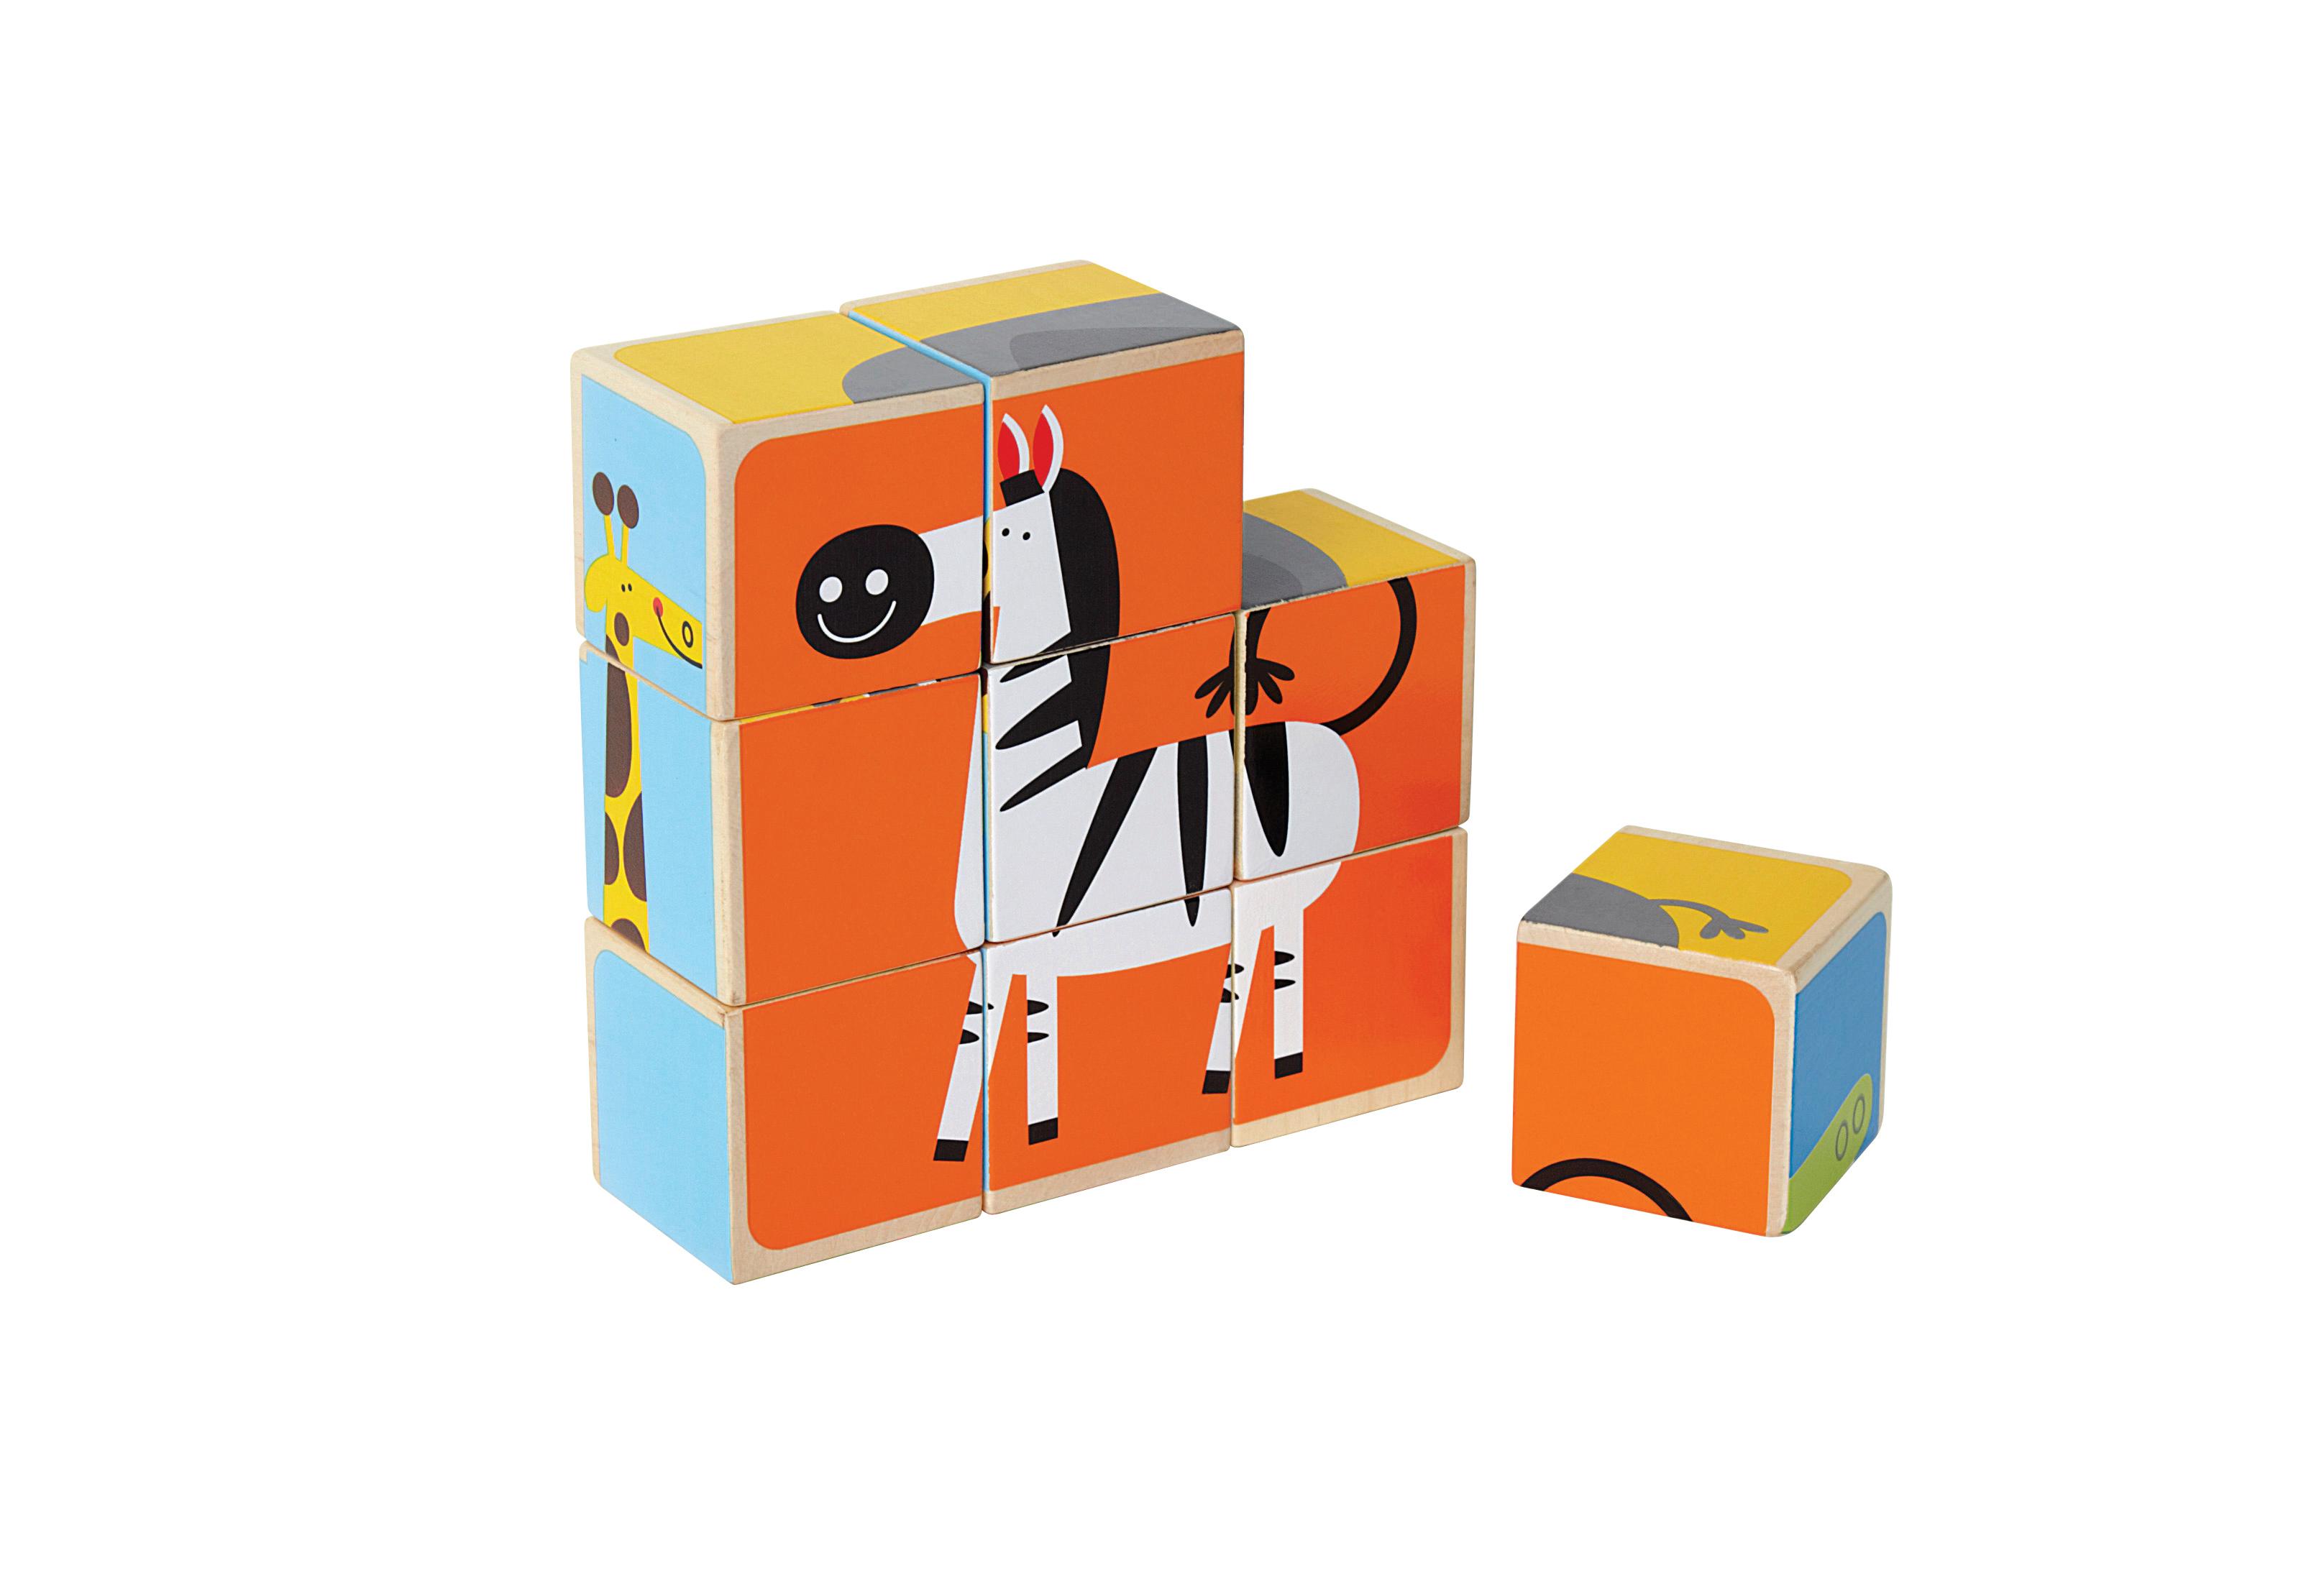 Zoo Animal Block Puzzle, Hape wooden block puzzle, wooden ...